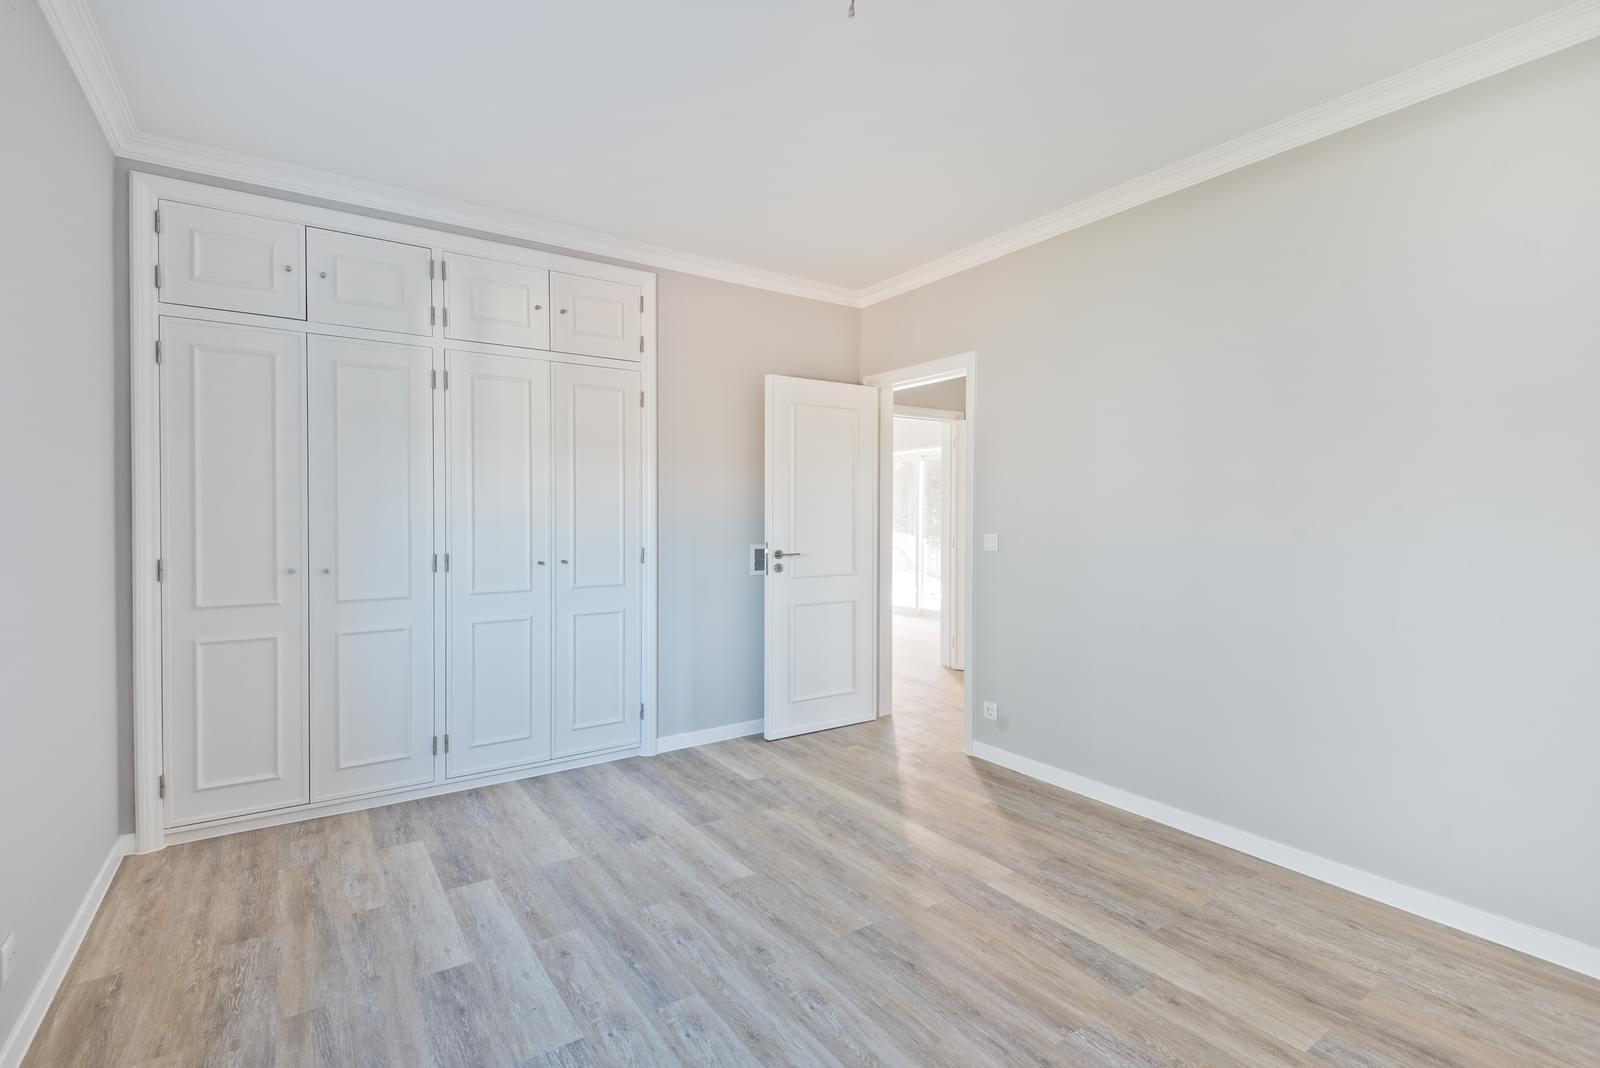 pf18907-apartamento-t2-cascais-9f57cf3d-b12b-4a25-ab32-056a78cdb9c4